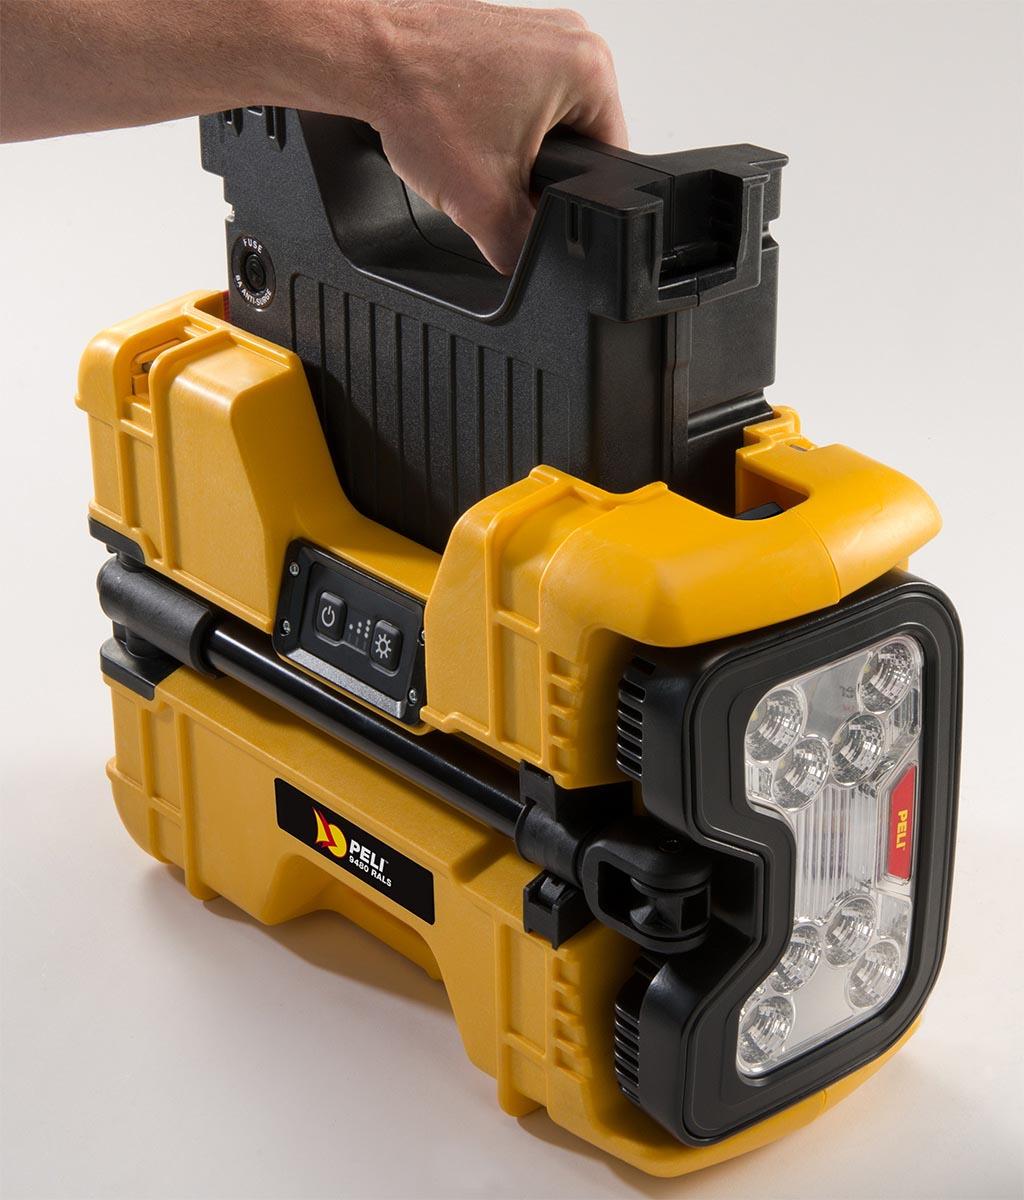 peli led spot light battery 9480 rals